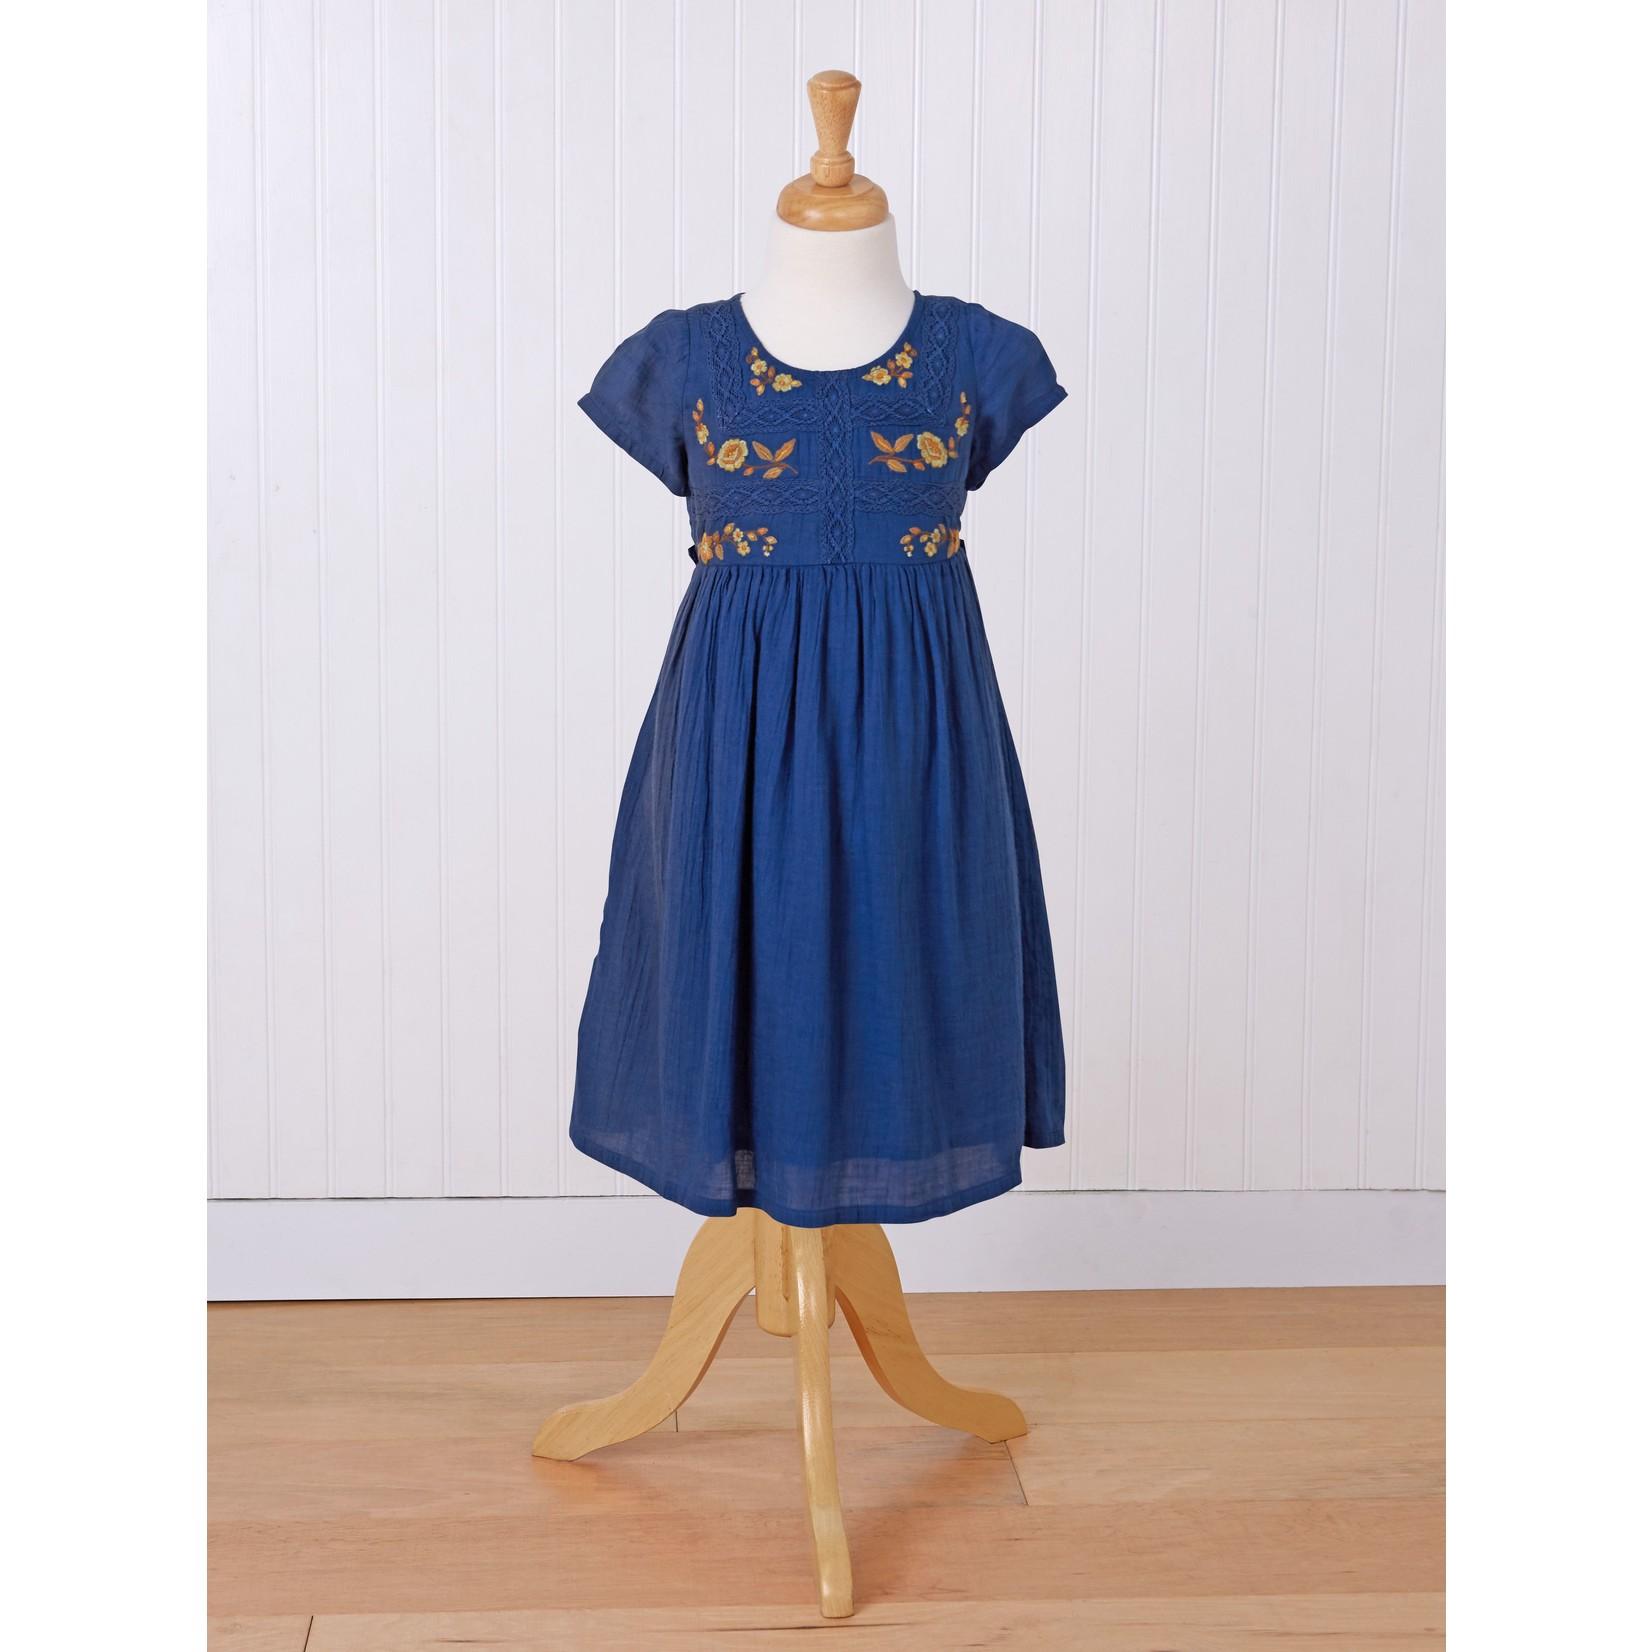 April Cornell Rosa Dress